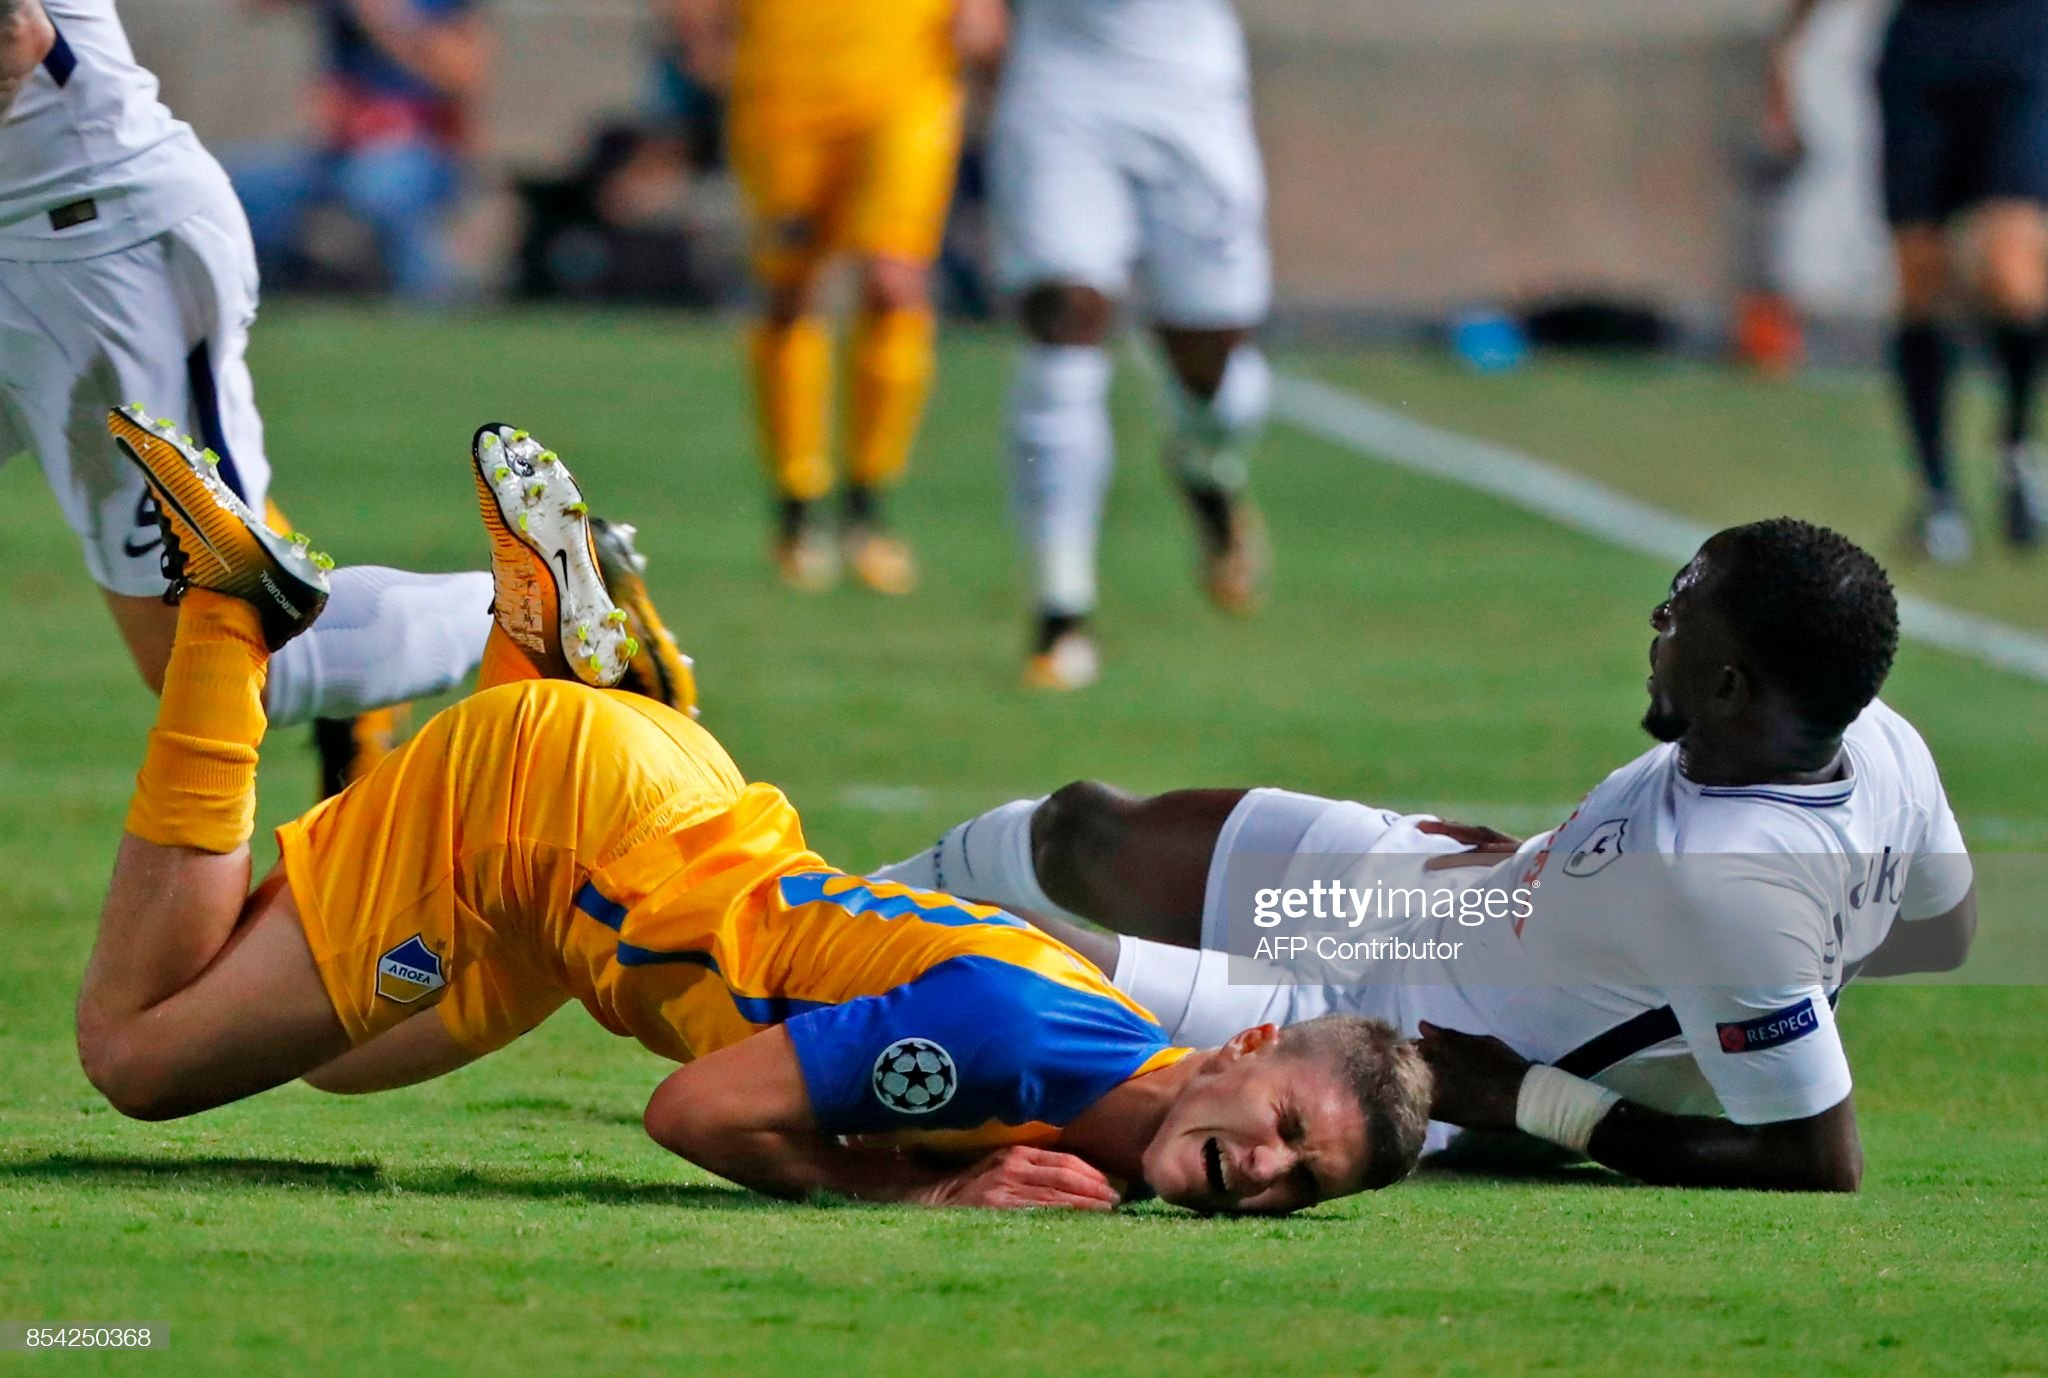 [Image: tottenham-hotspurs-french-midfielder-mou...=2048x2048]